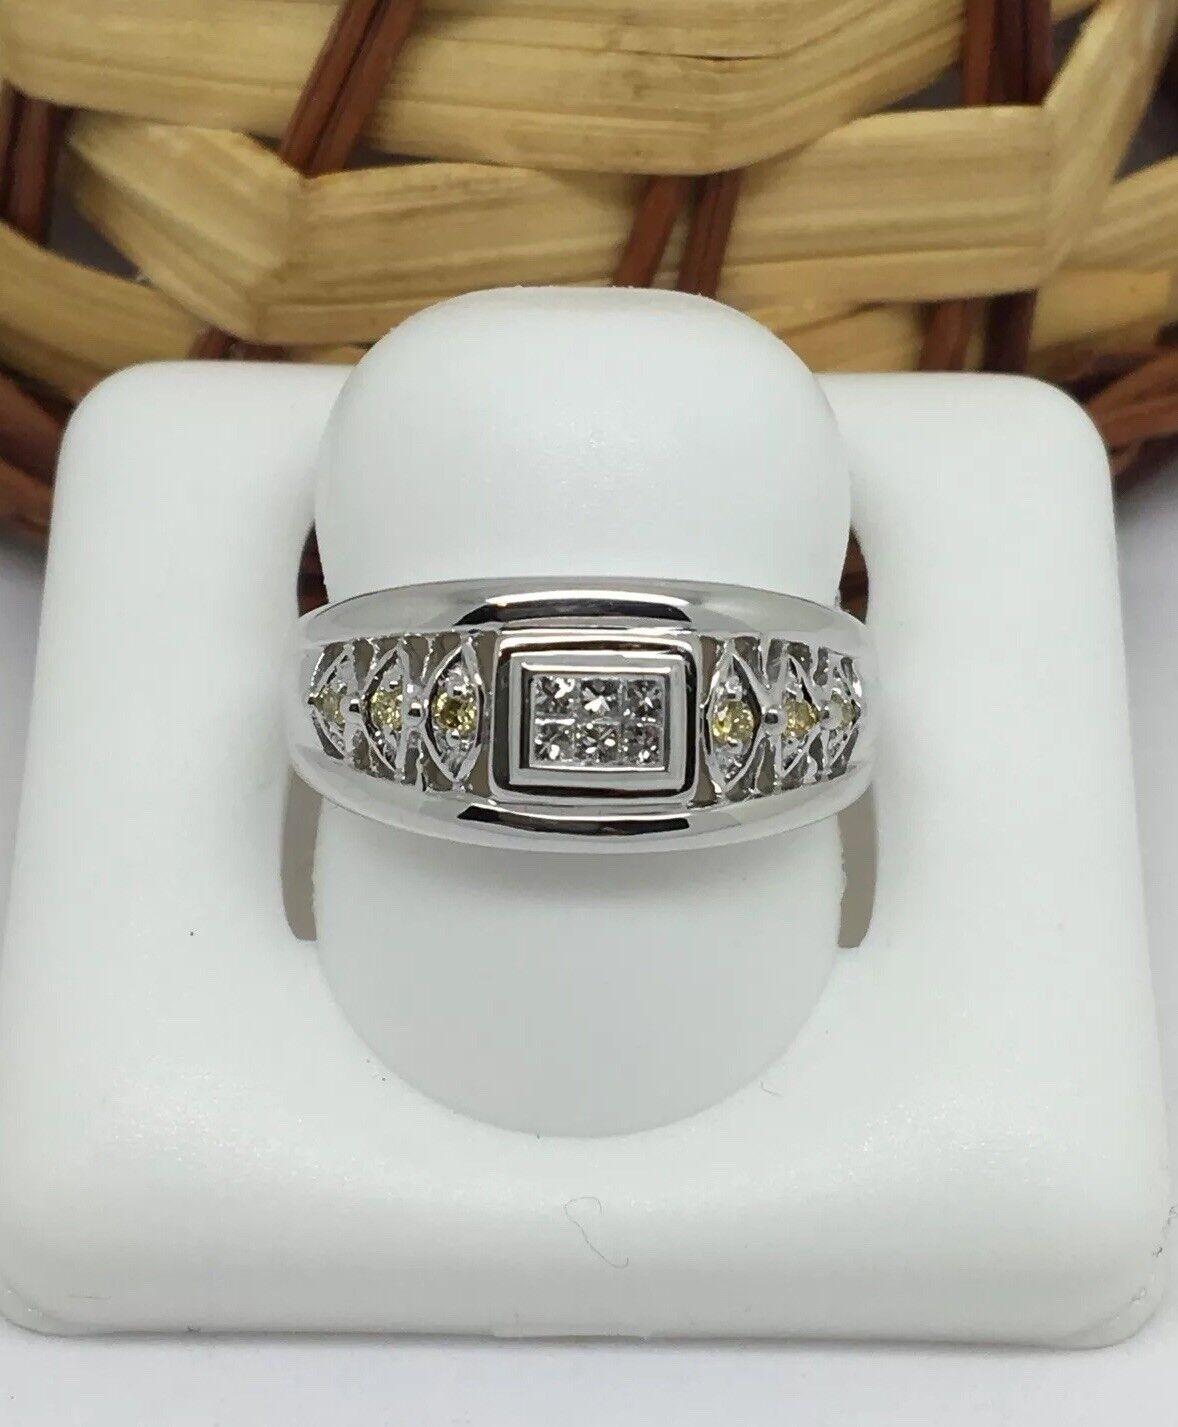 e2364974484ab 18K White gold Natural Diamond Ring vtrg3b6f14233-Diamond